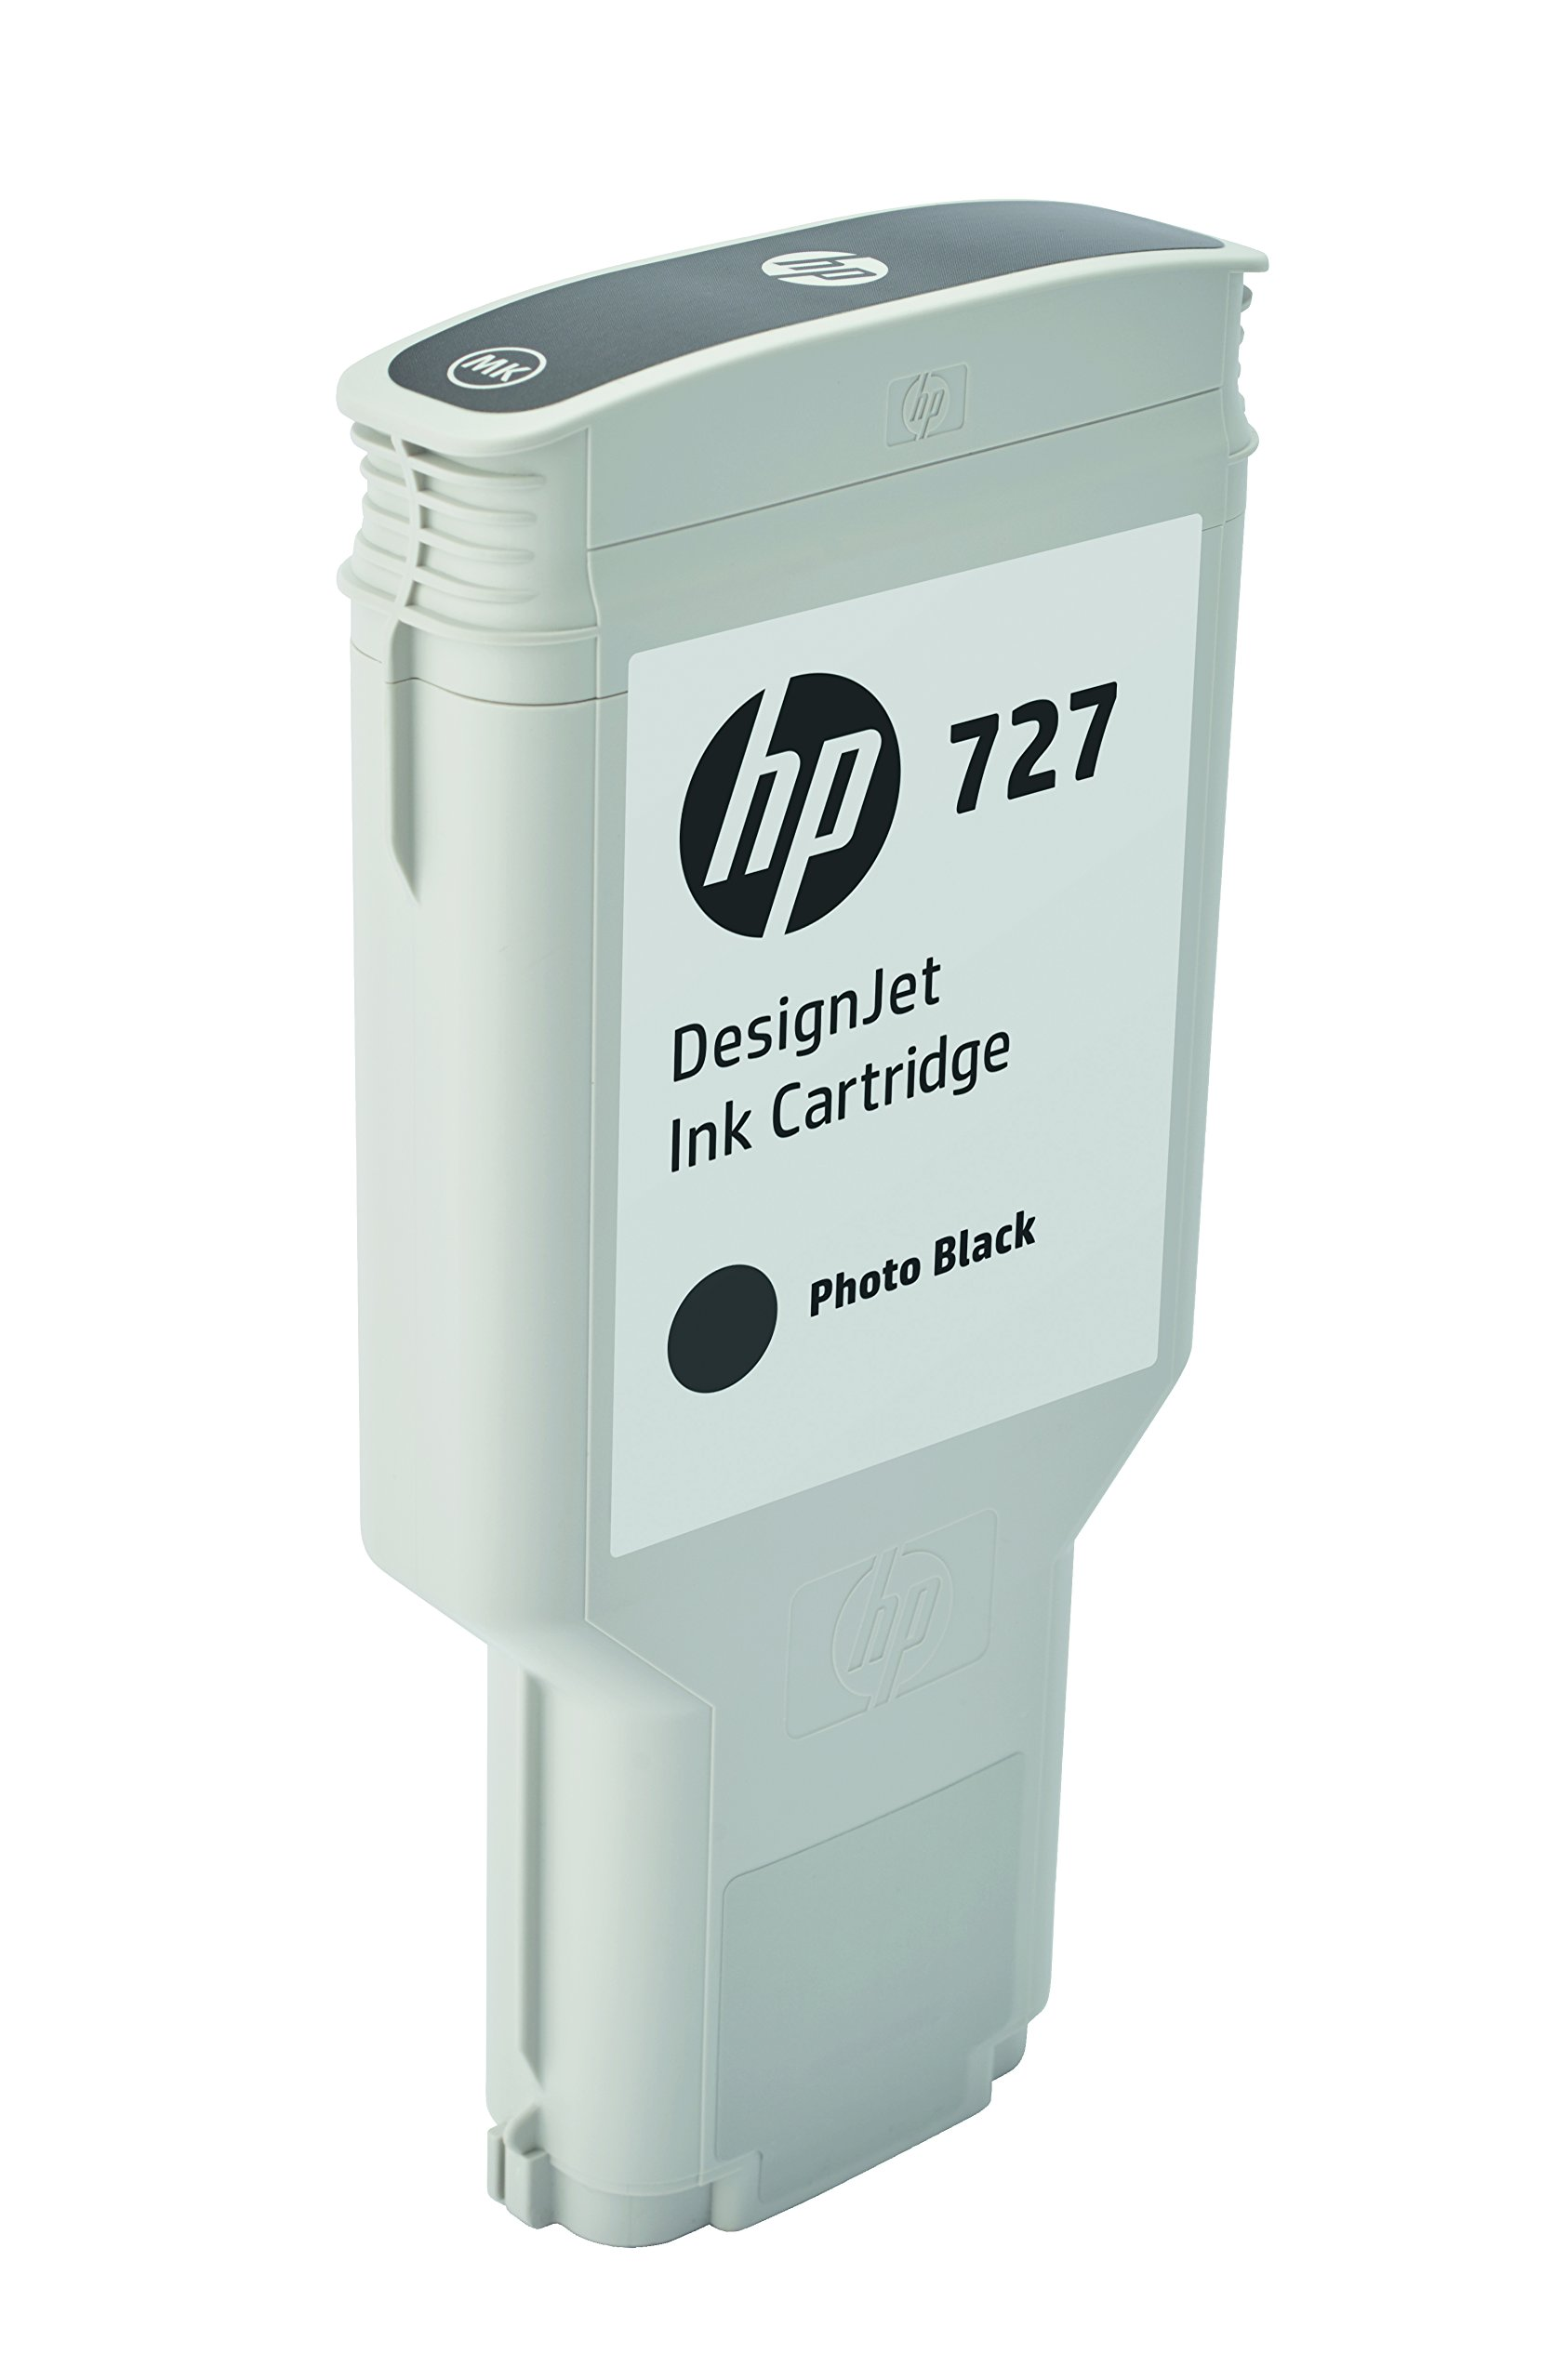 Hp 727 Designjet Ink Cartridge, 300 ml - Photo Black